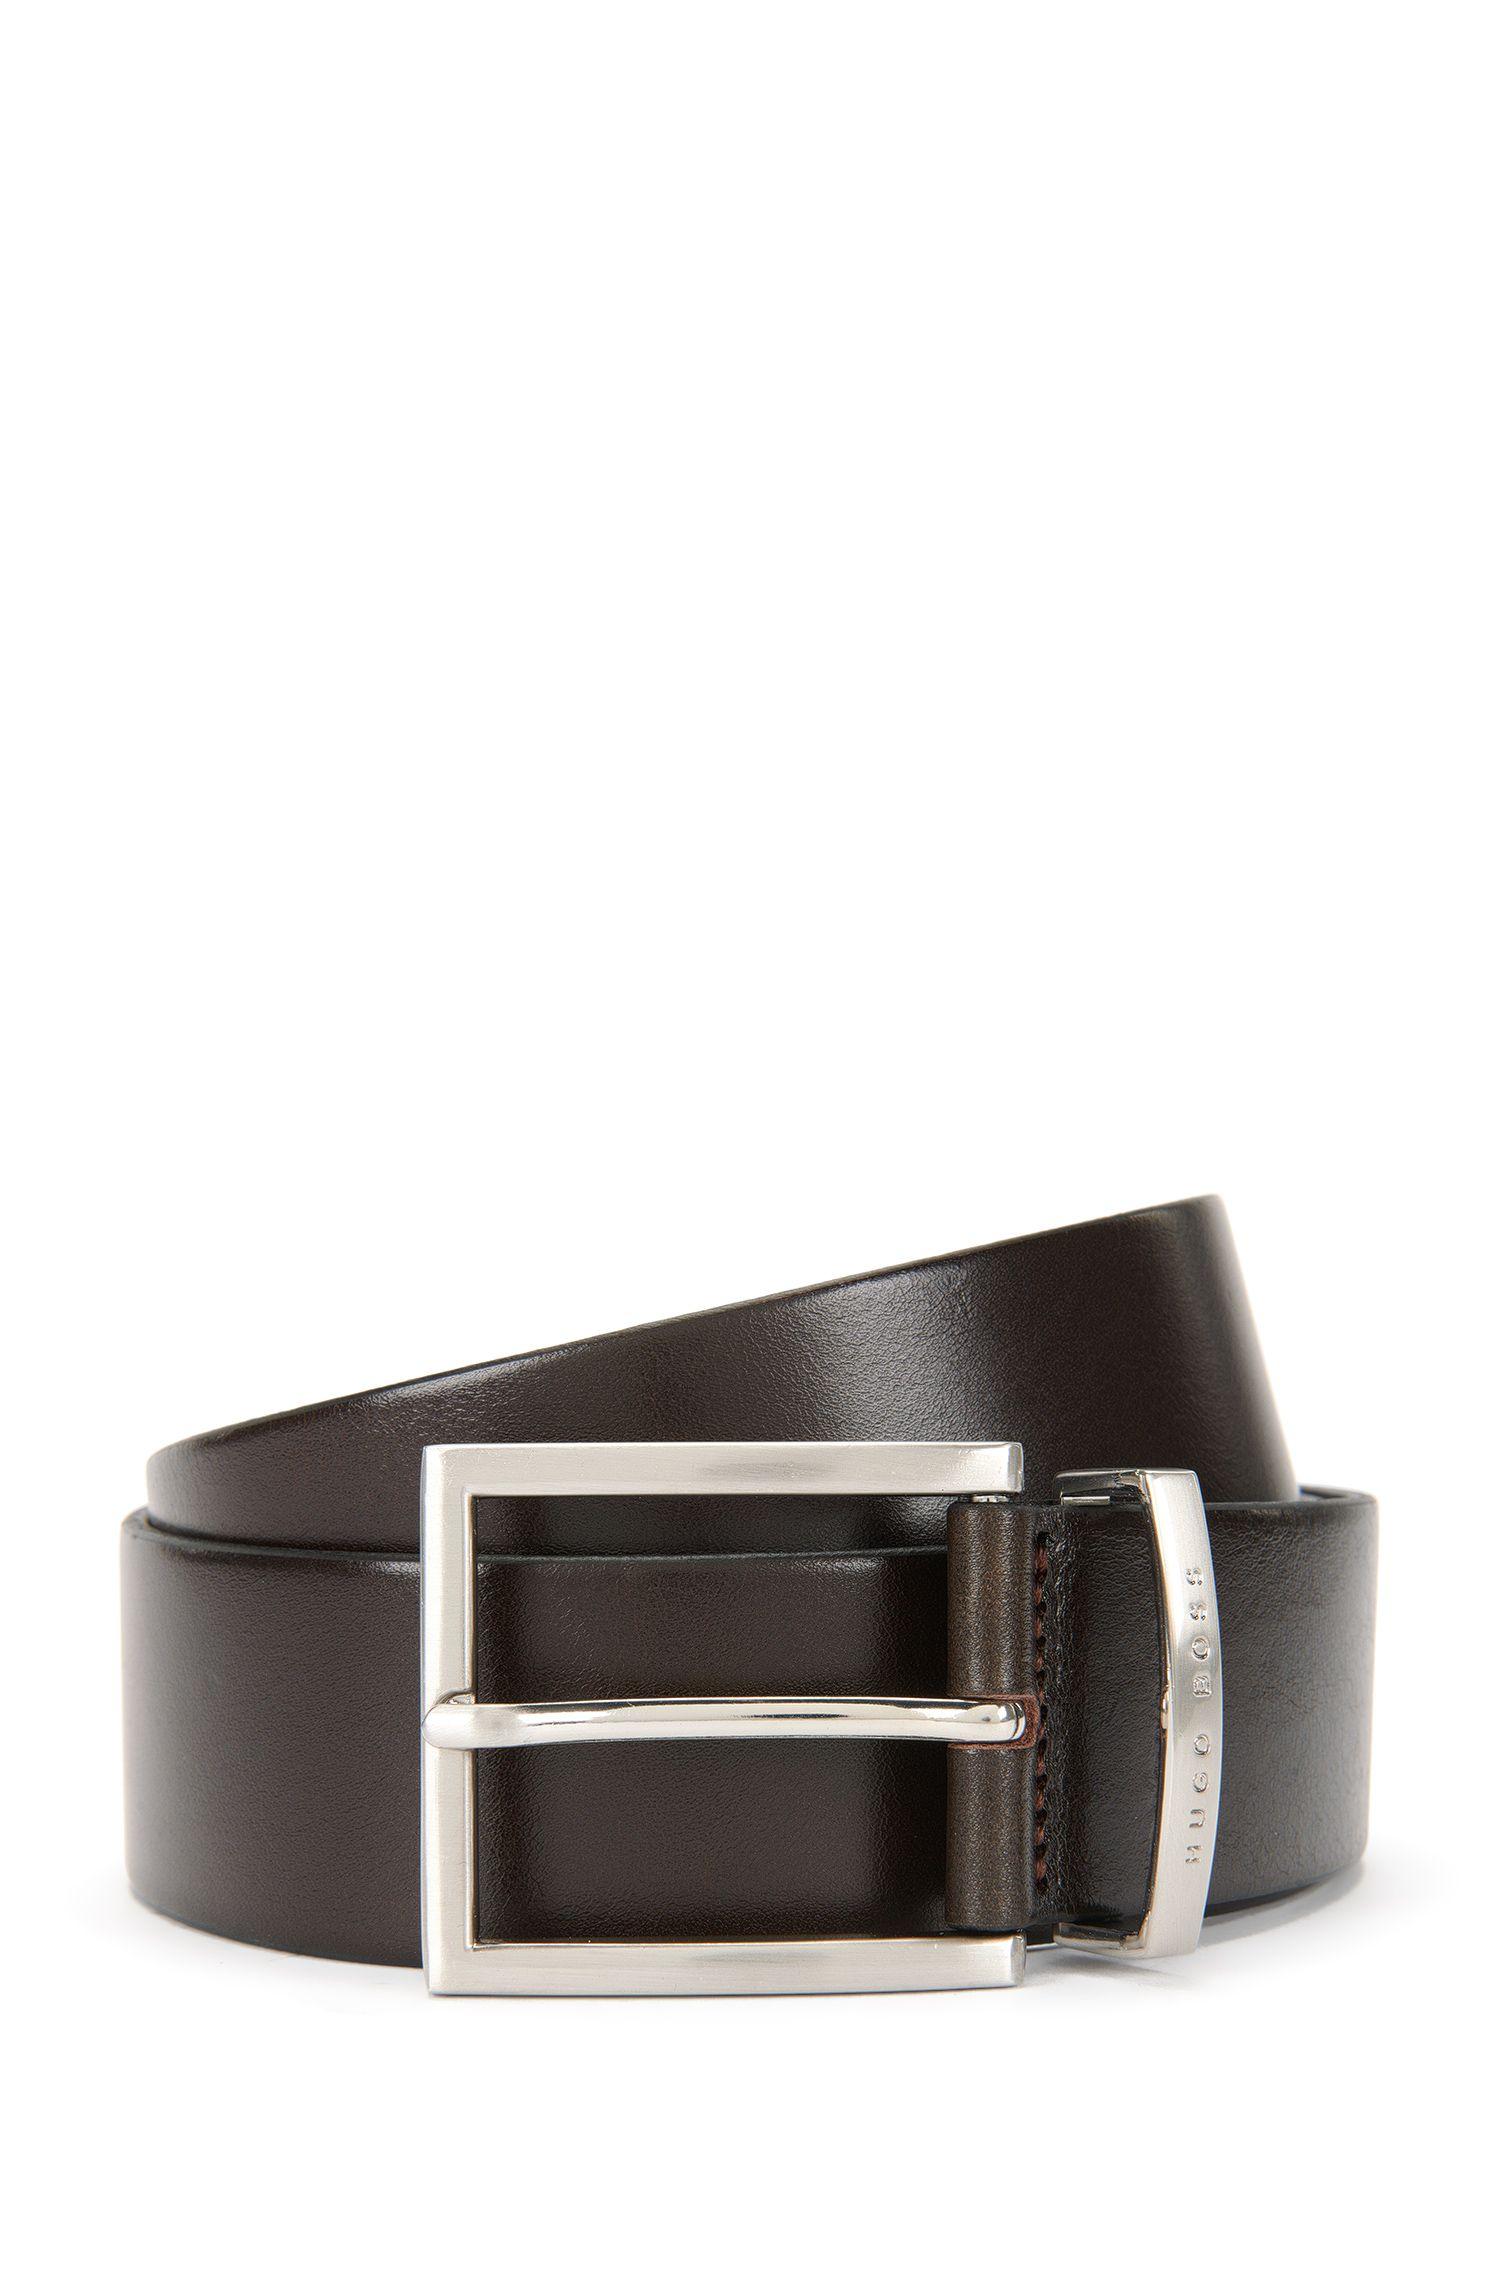 Leather Belt | Buddy